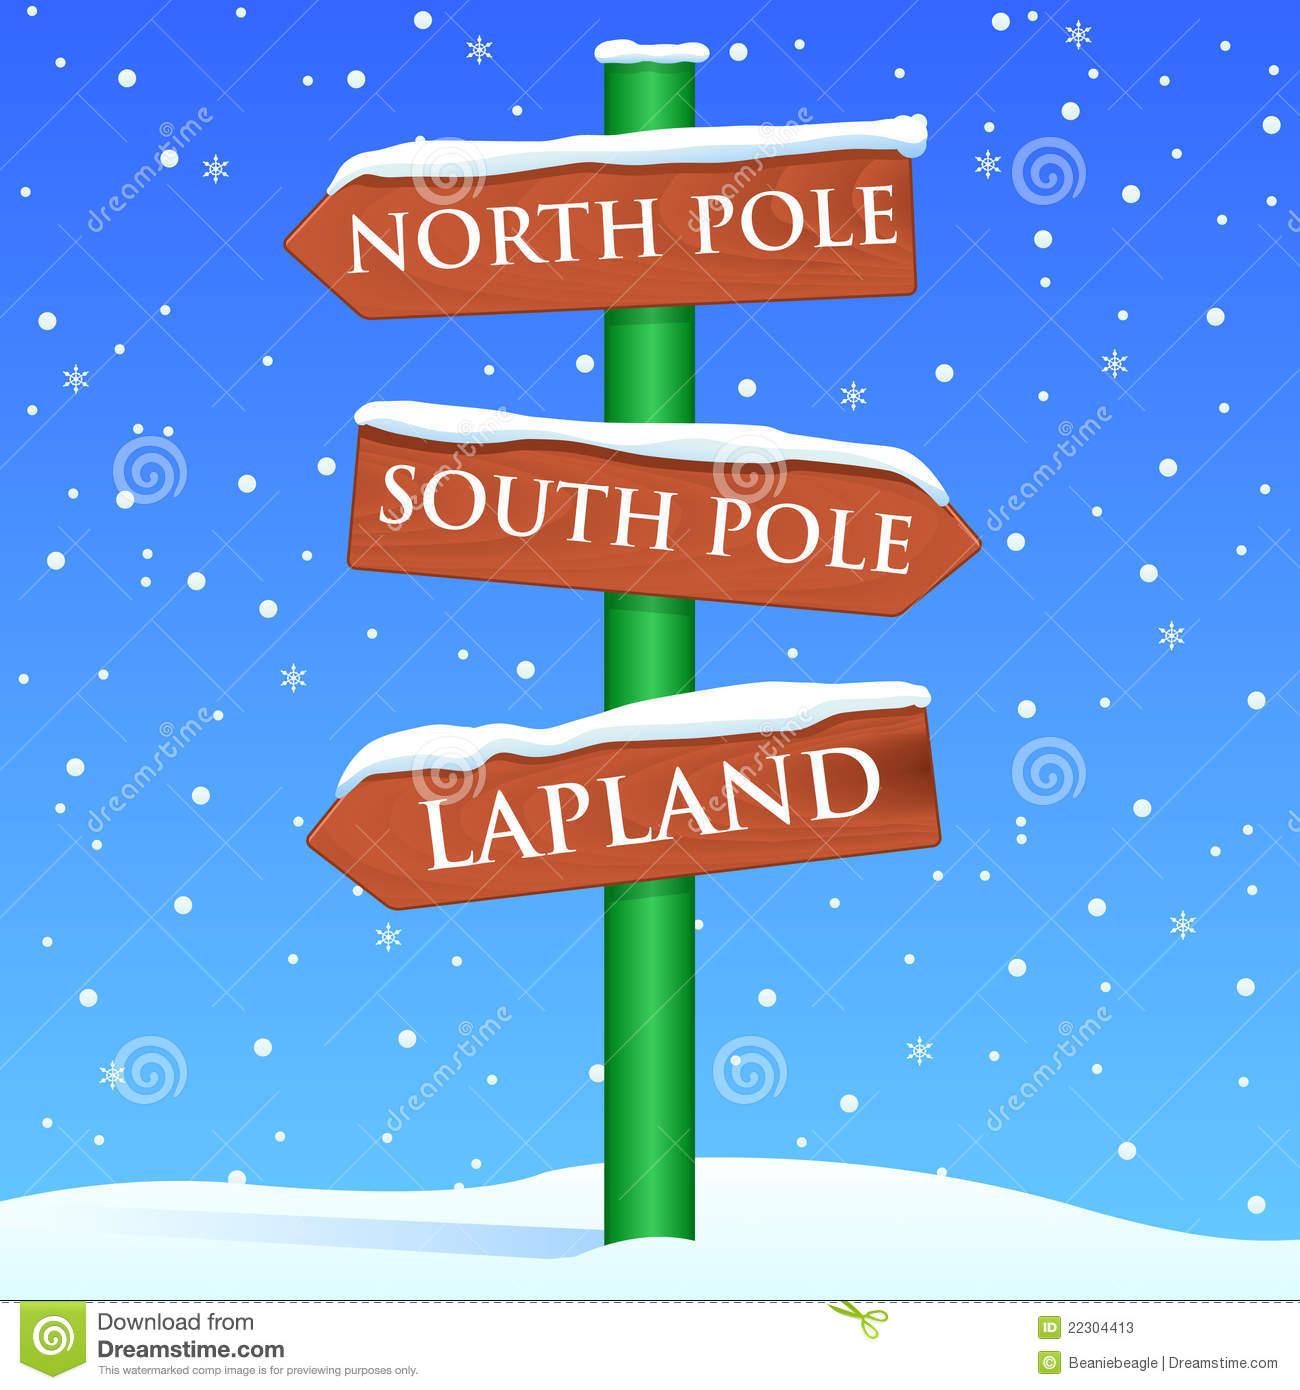 Lapland Stock Illustrations.